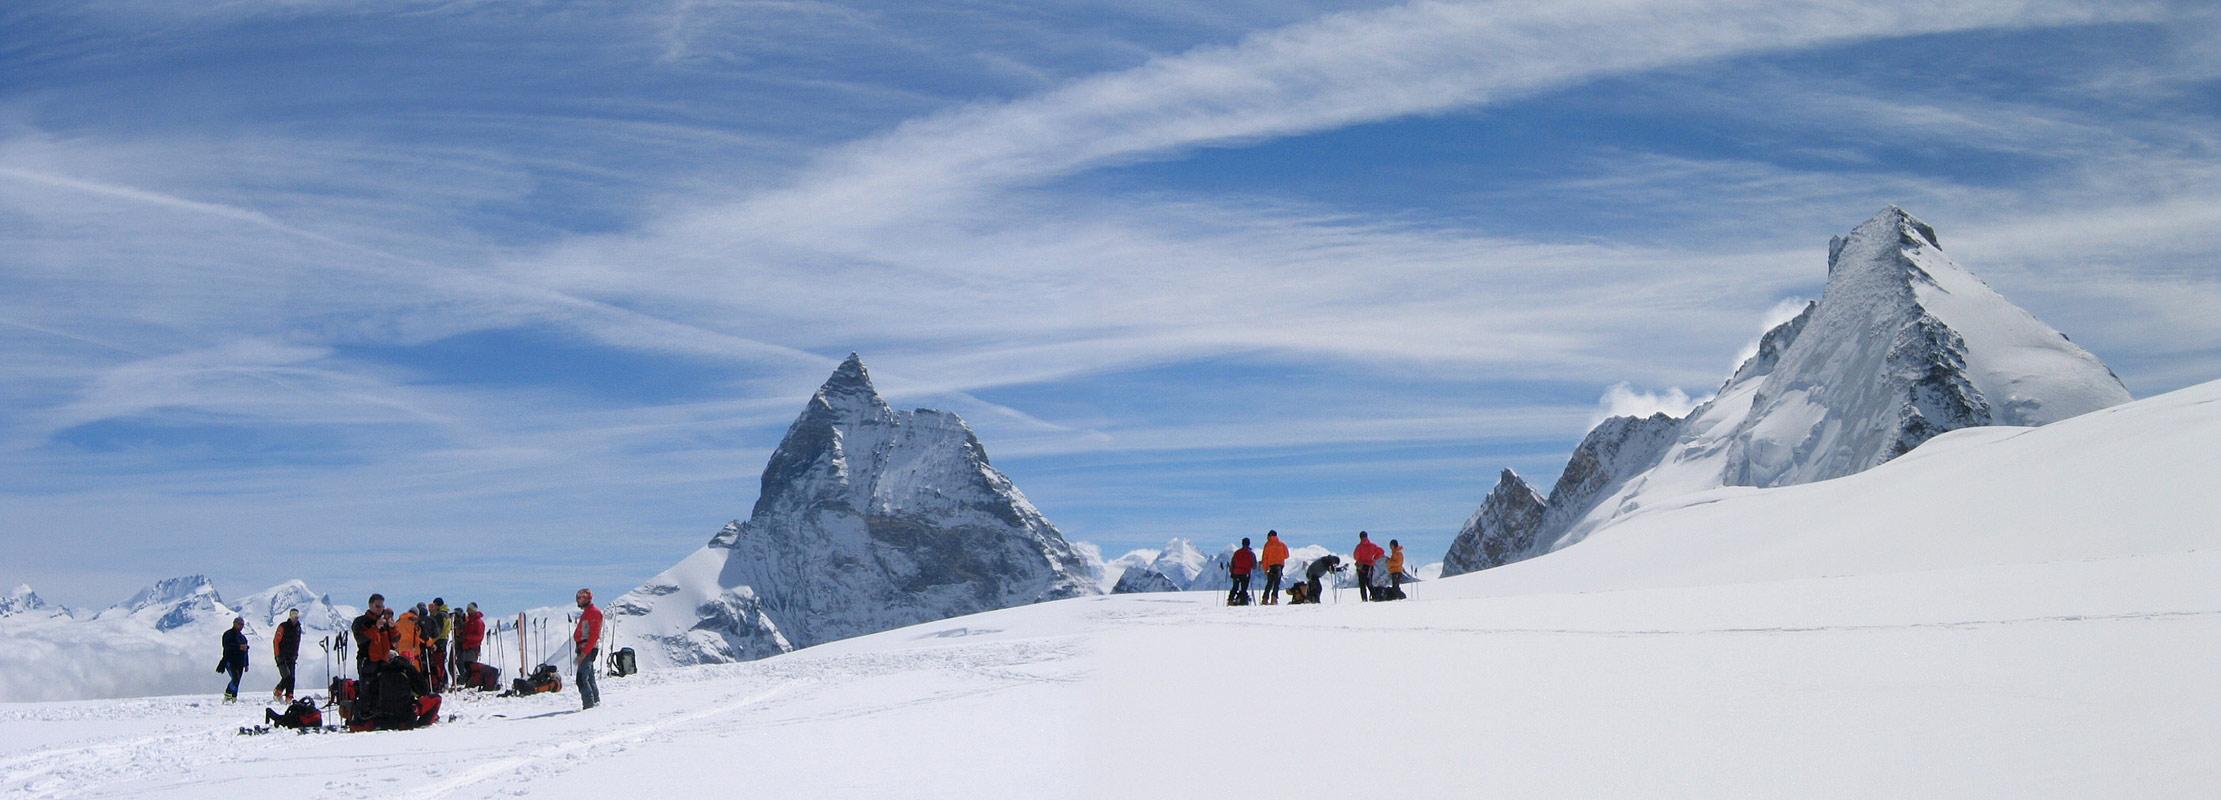 Col Valpelline, Day 6 H.R. Chamonix-Zermatt Walliser Alpen / Alpes valaisannes Švýcarsko panorama 47